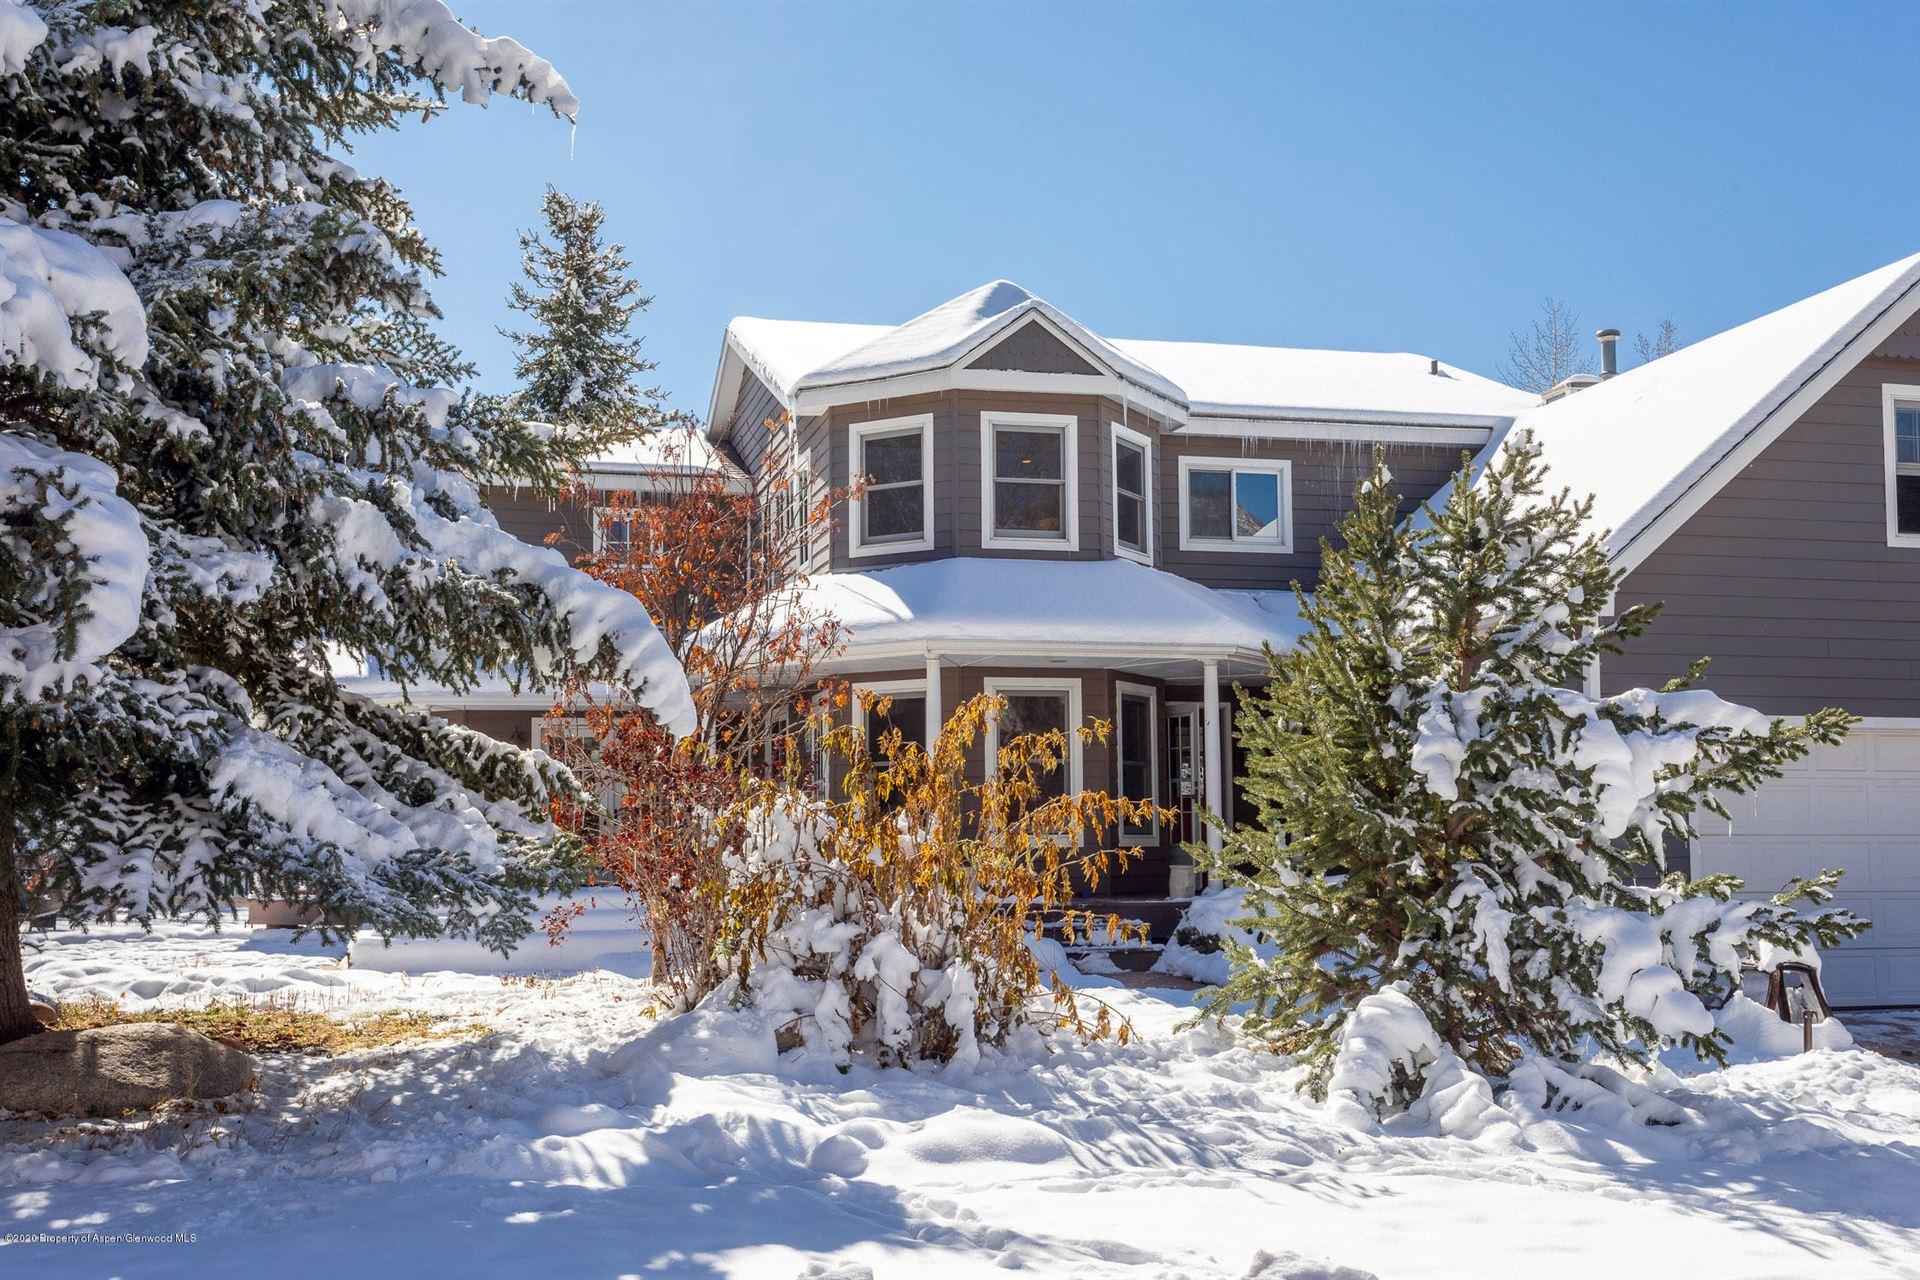 720 Hearthstone Drive, Basalt, CO 81621 - MLS#: 167349